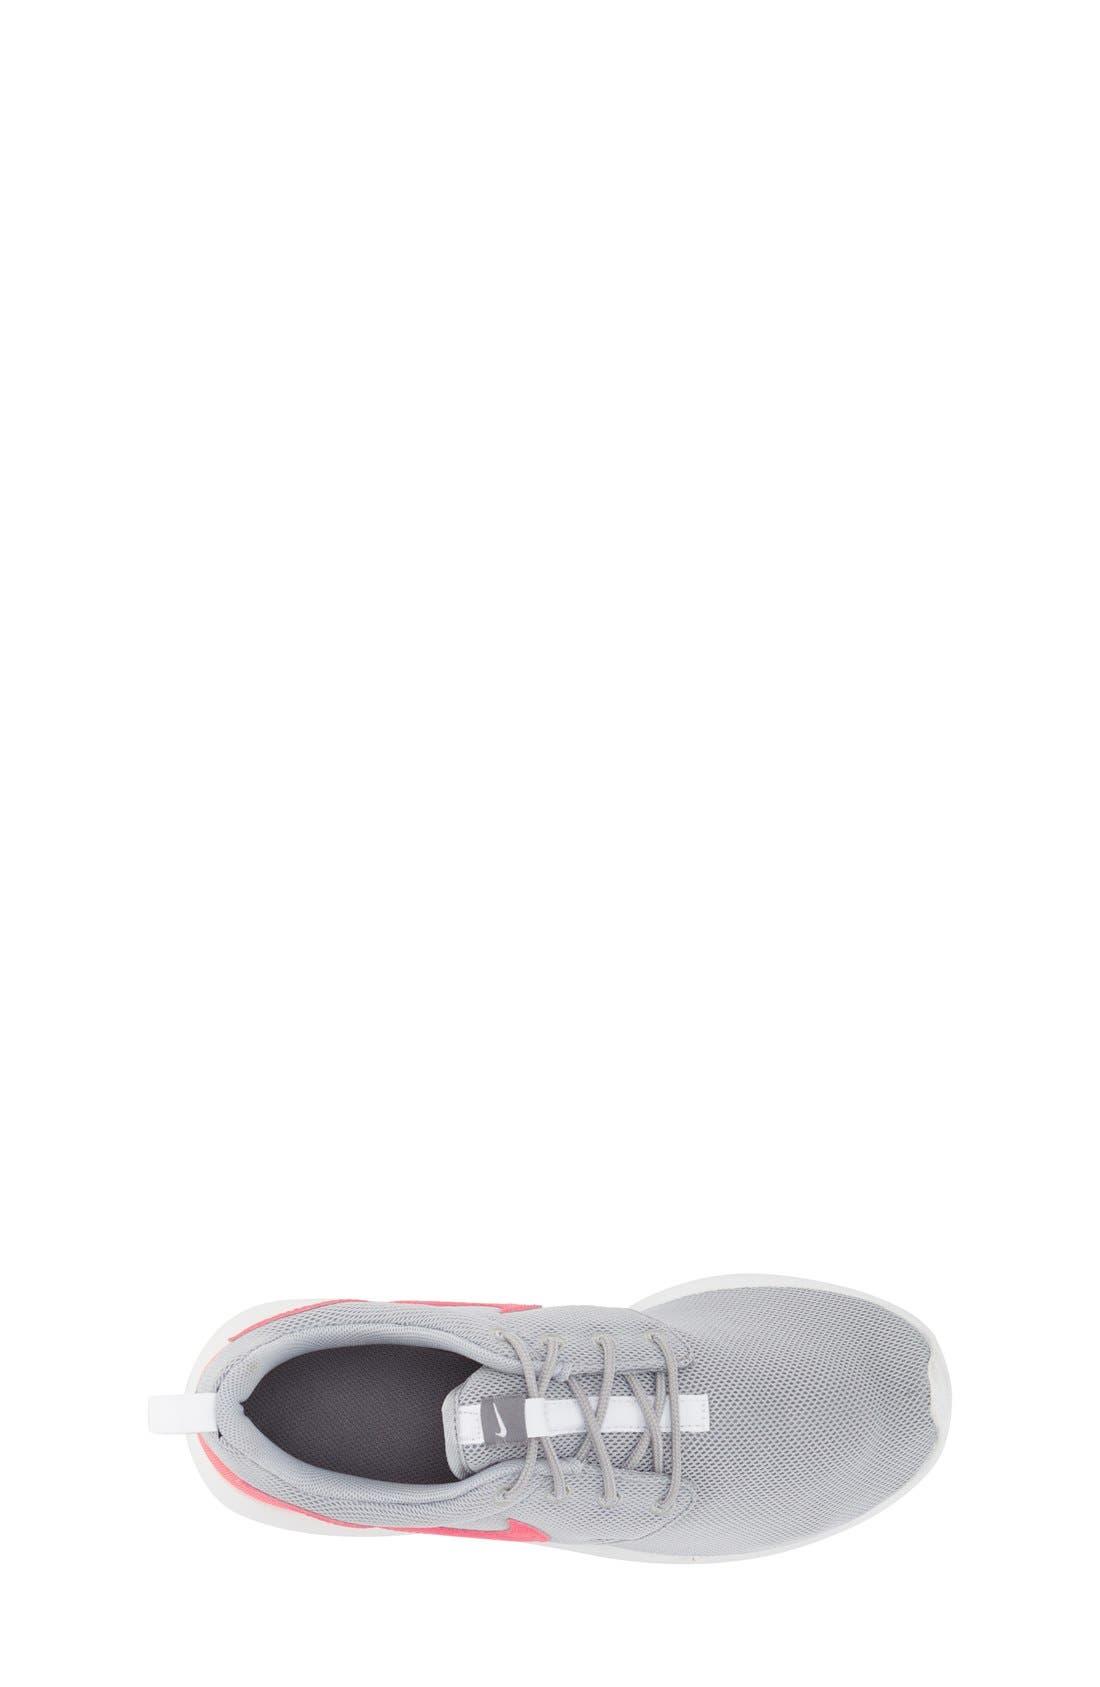 'Roshe Run' Athletic Shoe,                             Alternate thumbnail 79, color,